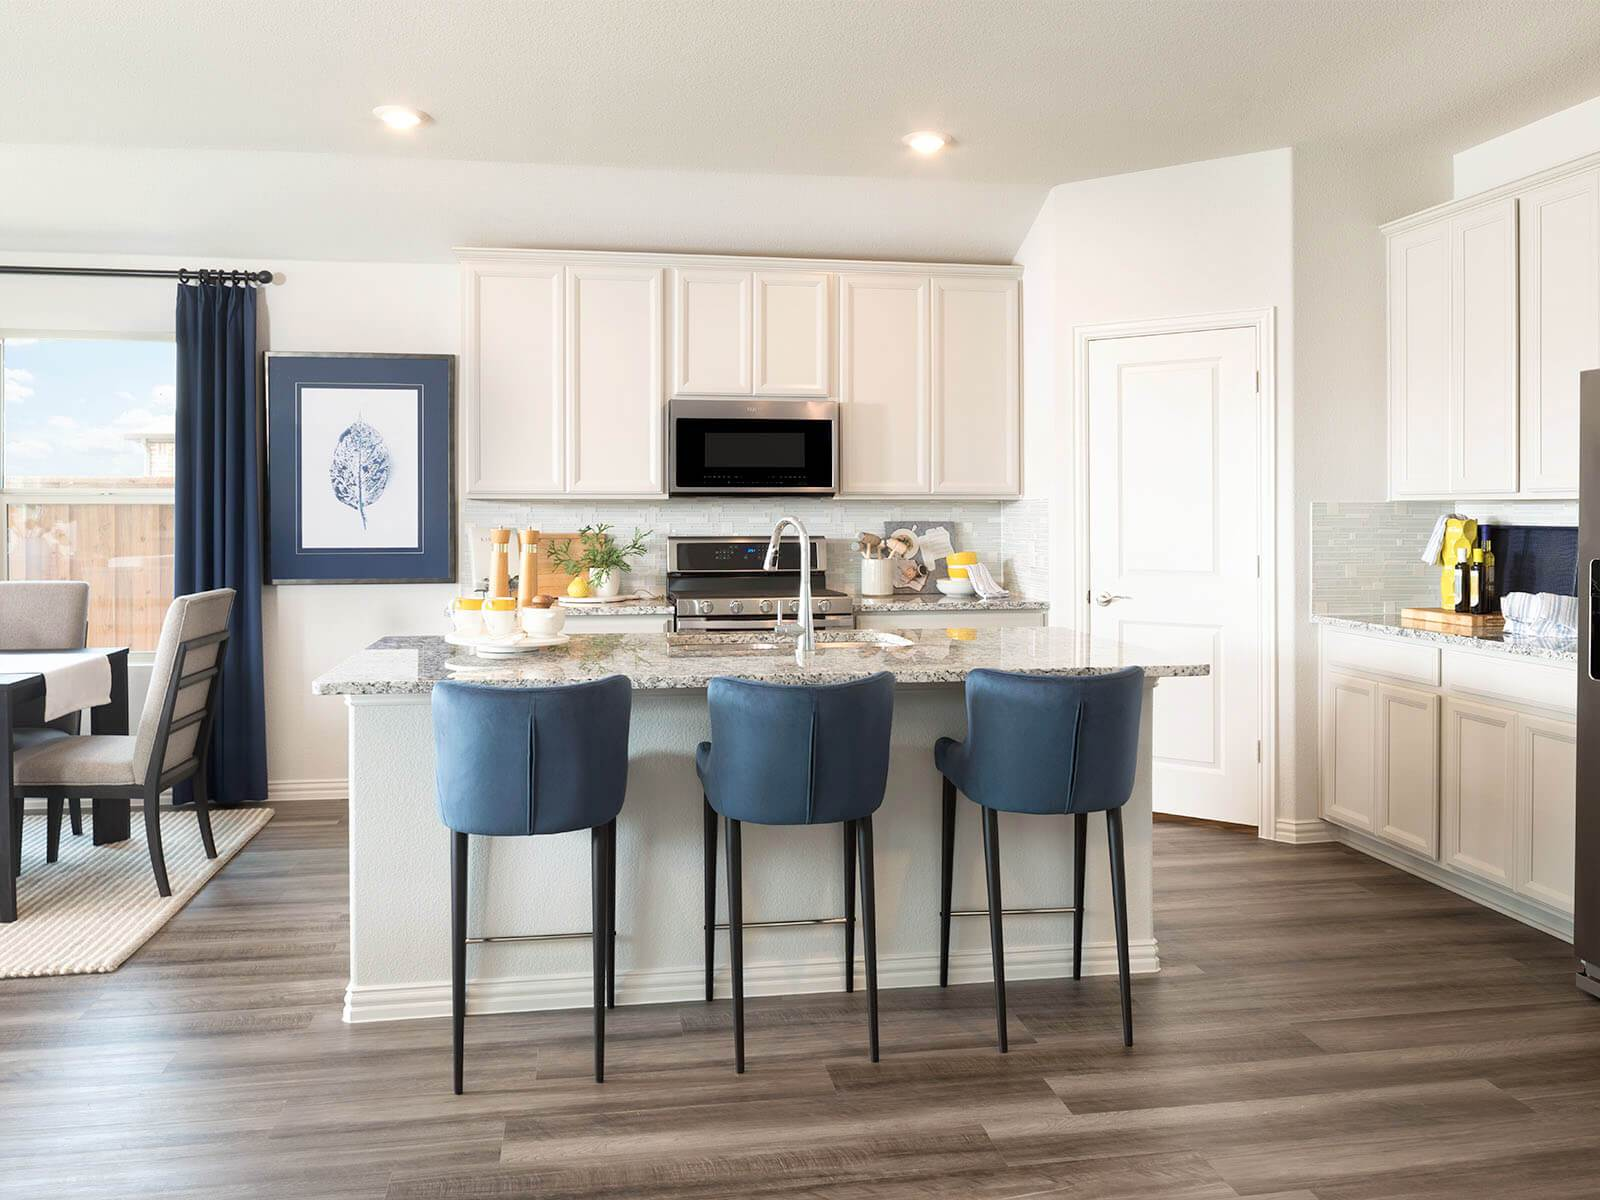 Kitchen featured in The Preston By Meritage Homes in Dallas, TX